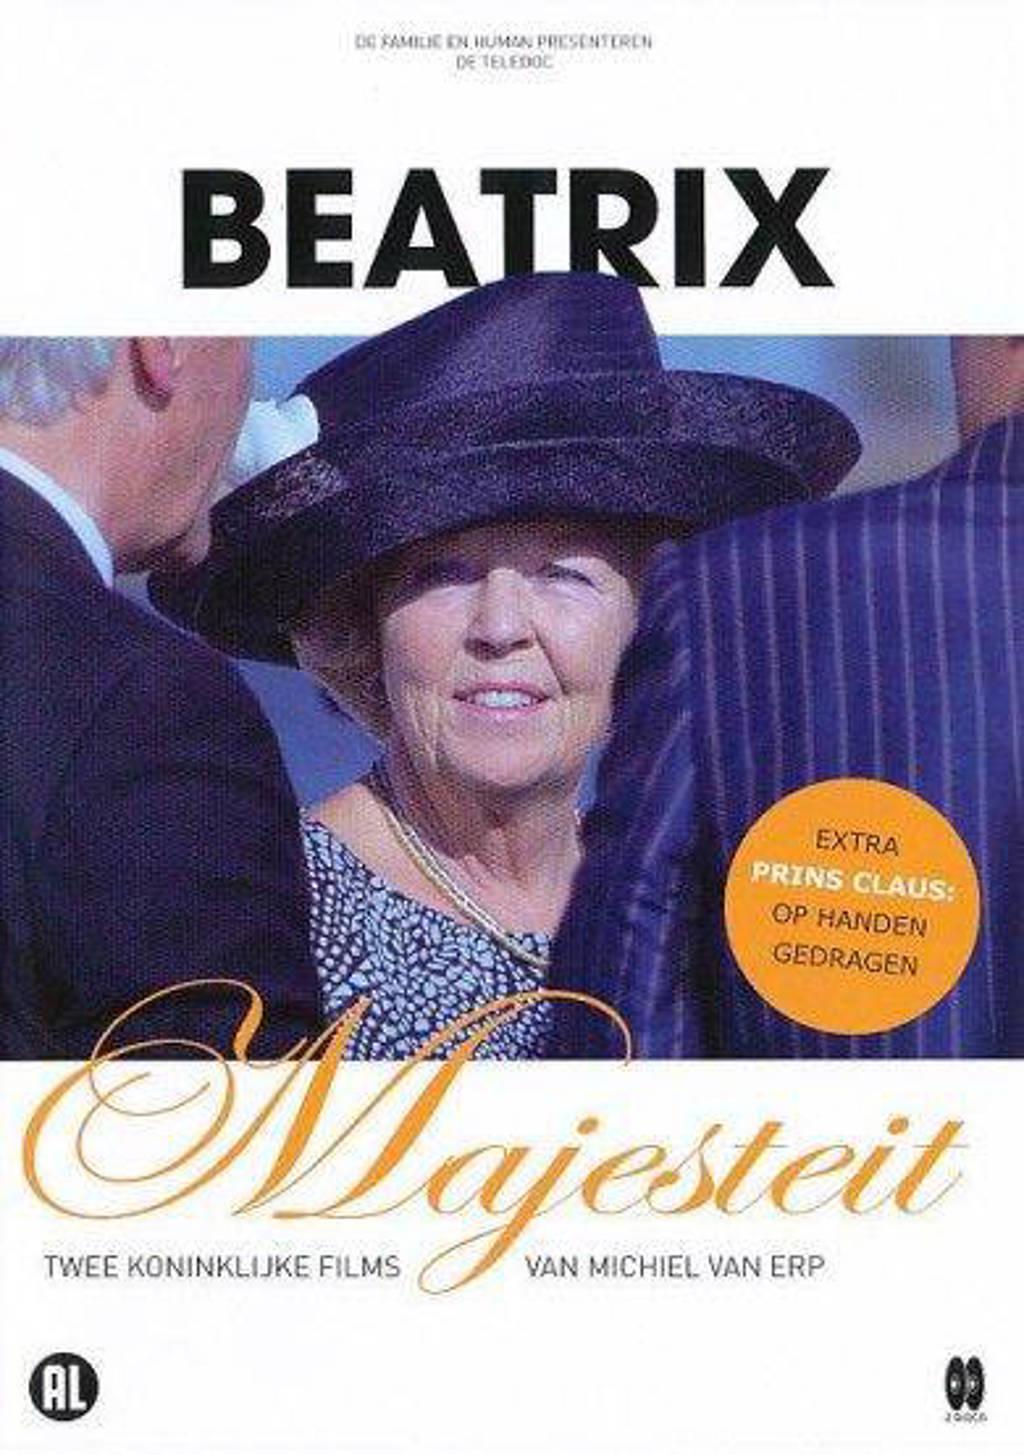 Beatrix majesteit (DVD)